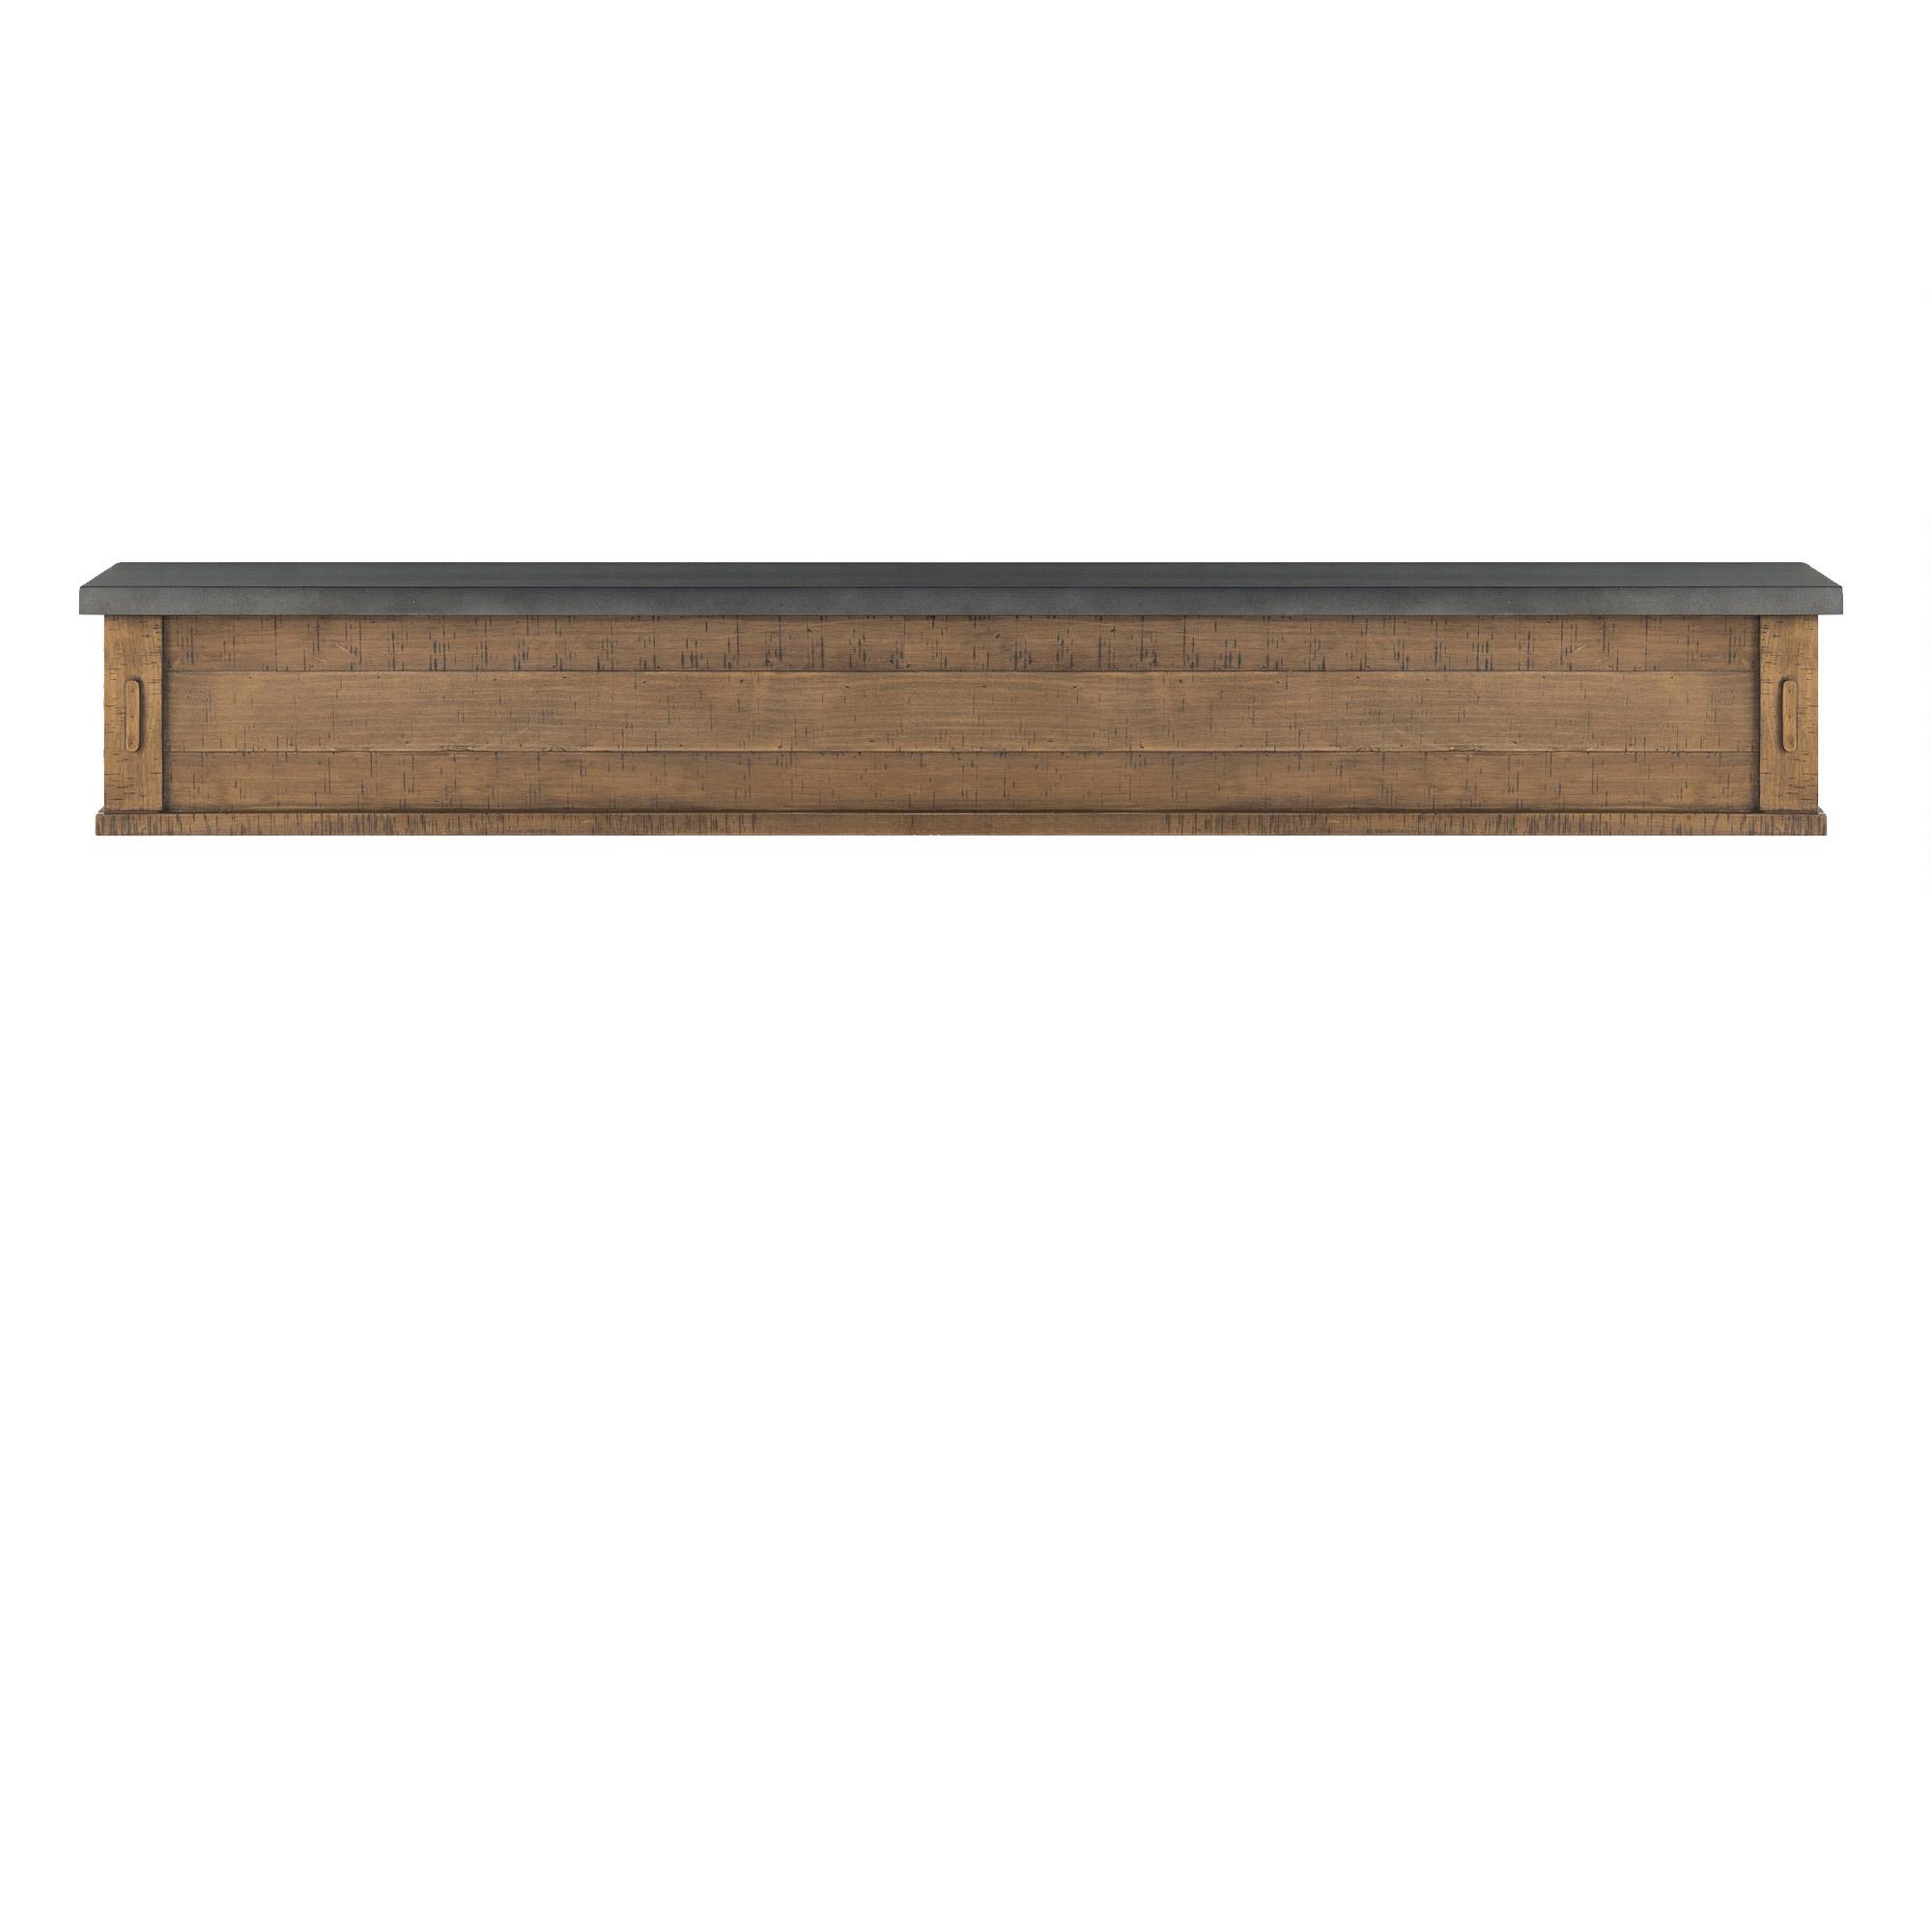 Wood stone mantels and shelf - Pierre decorative pour foyer ...